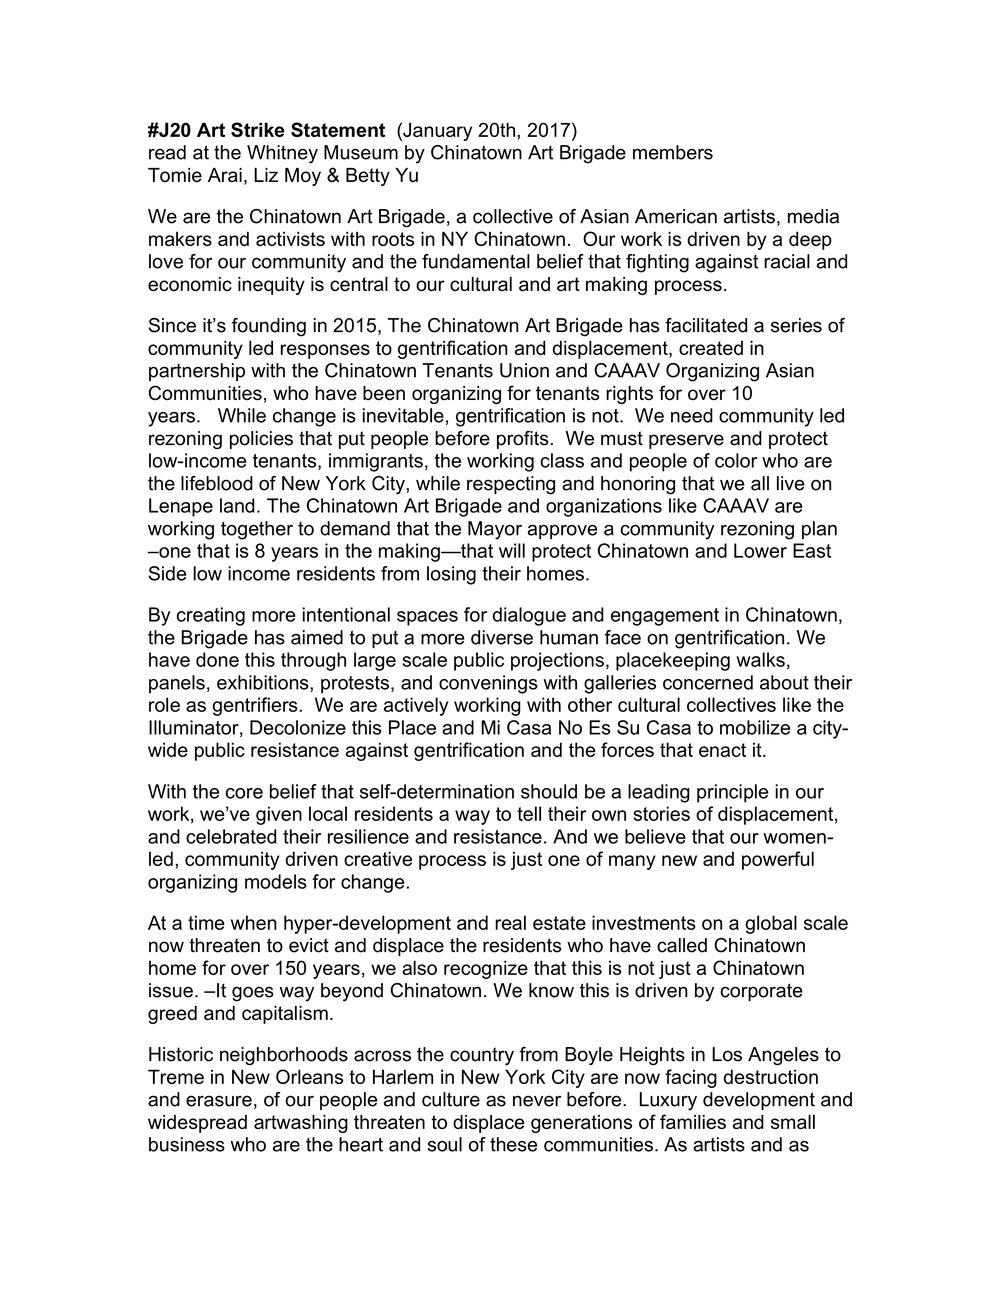 J20 Art Strike Statement.jpg